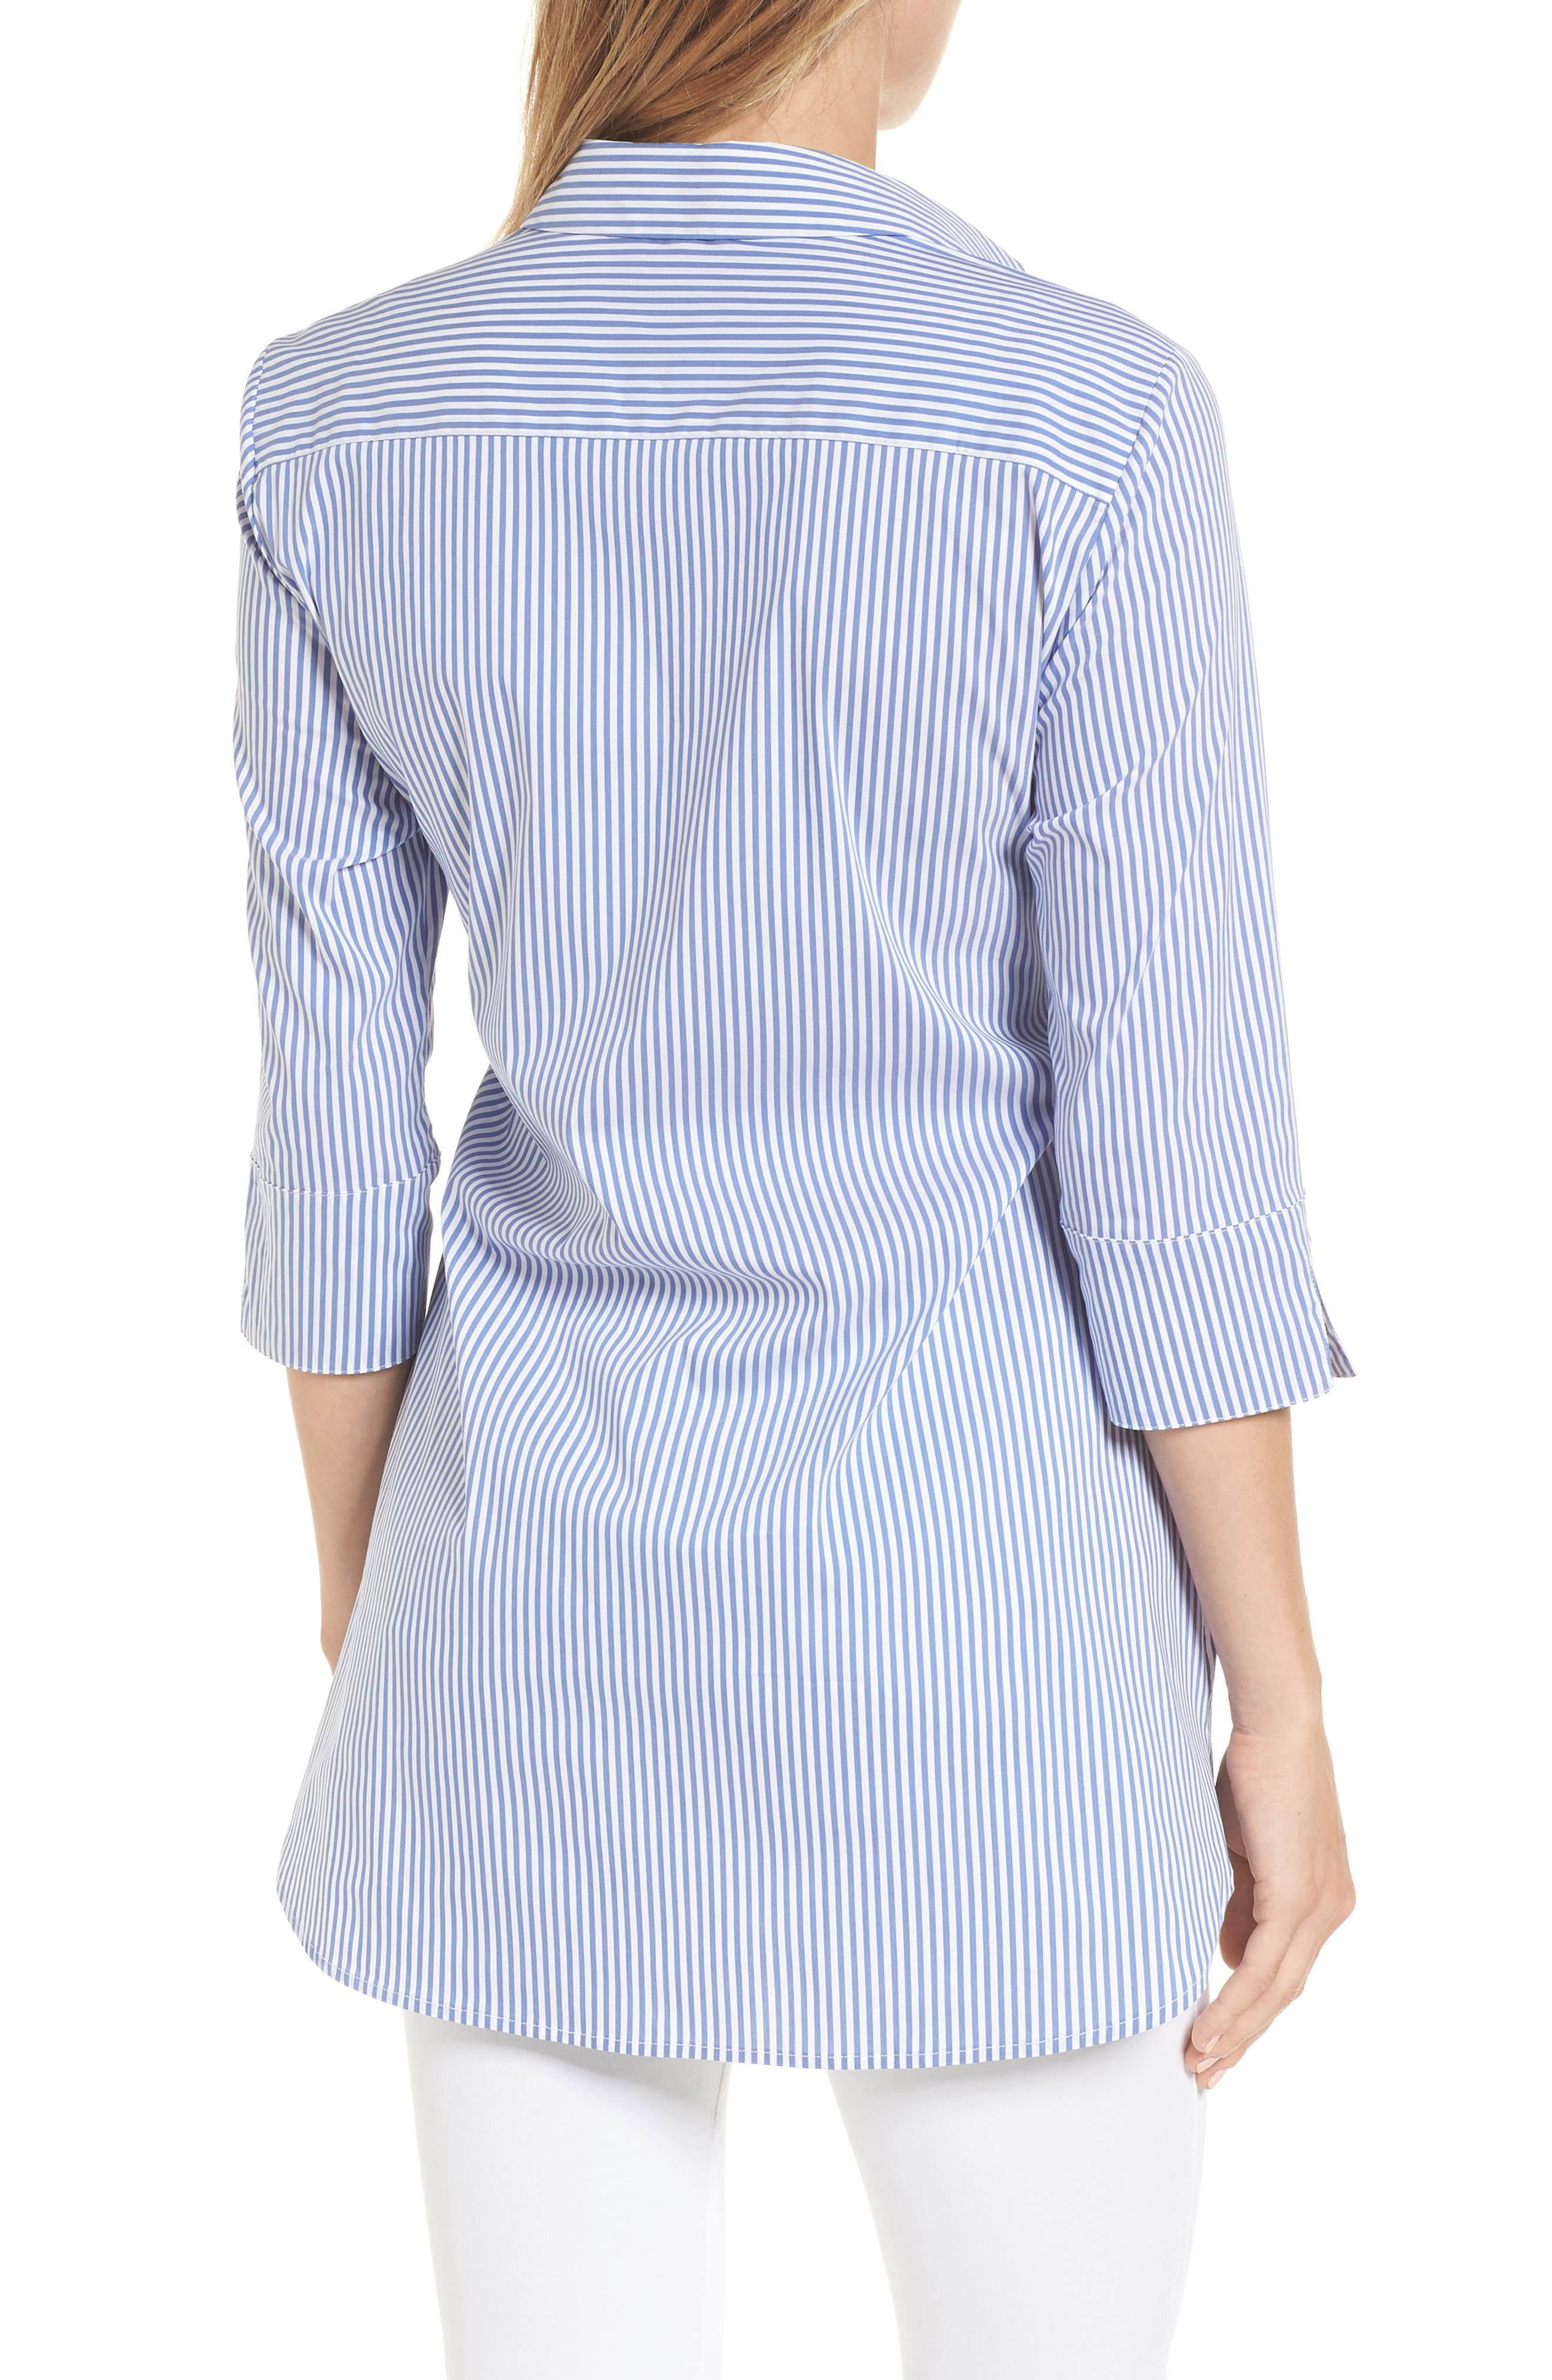 Dora Tie Front Maternity Shirt,                             Alternate thumbnail 2, color,                             BLUE/WHITE STRIPE